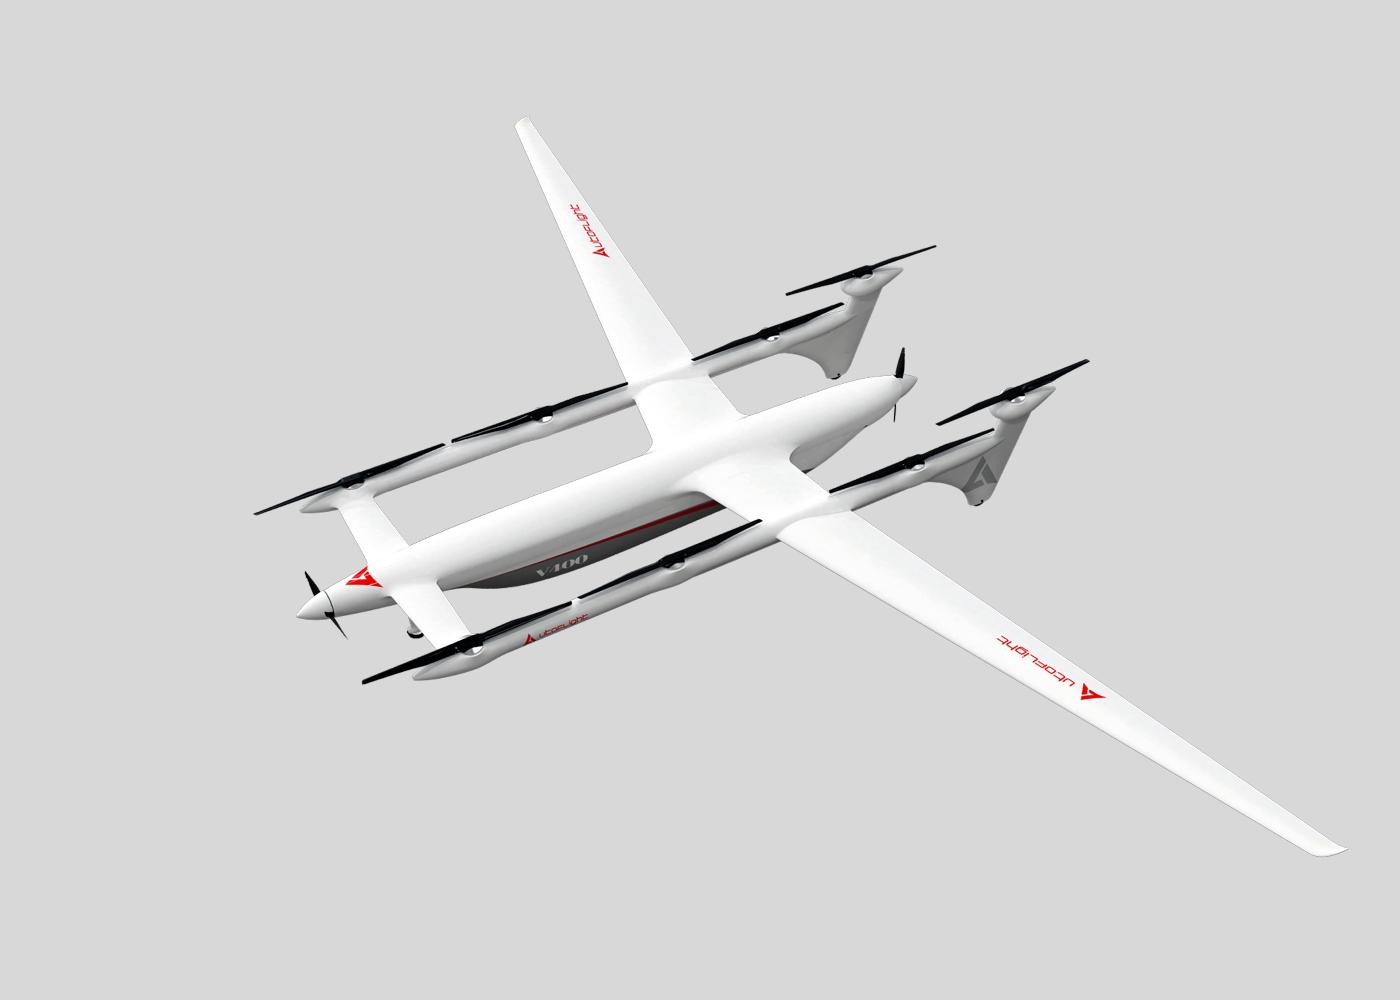 Autoflight V400 eVTOL cargo drone